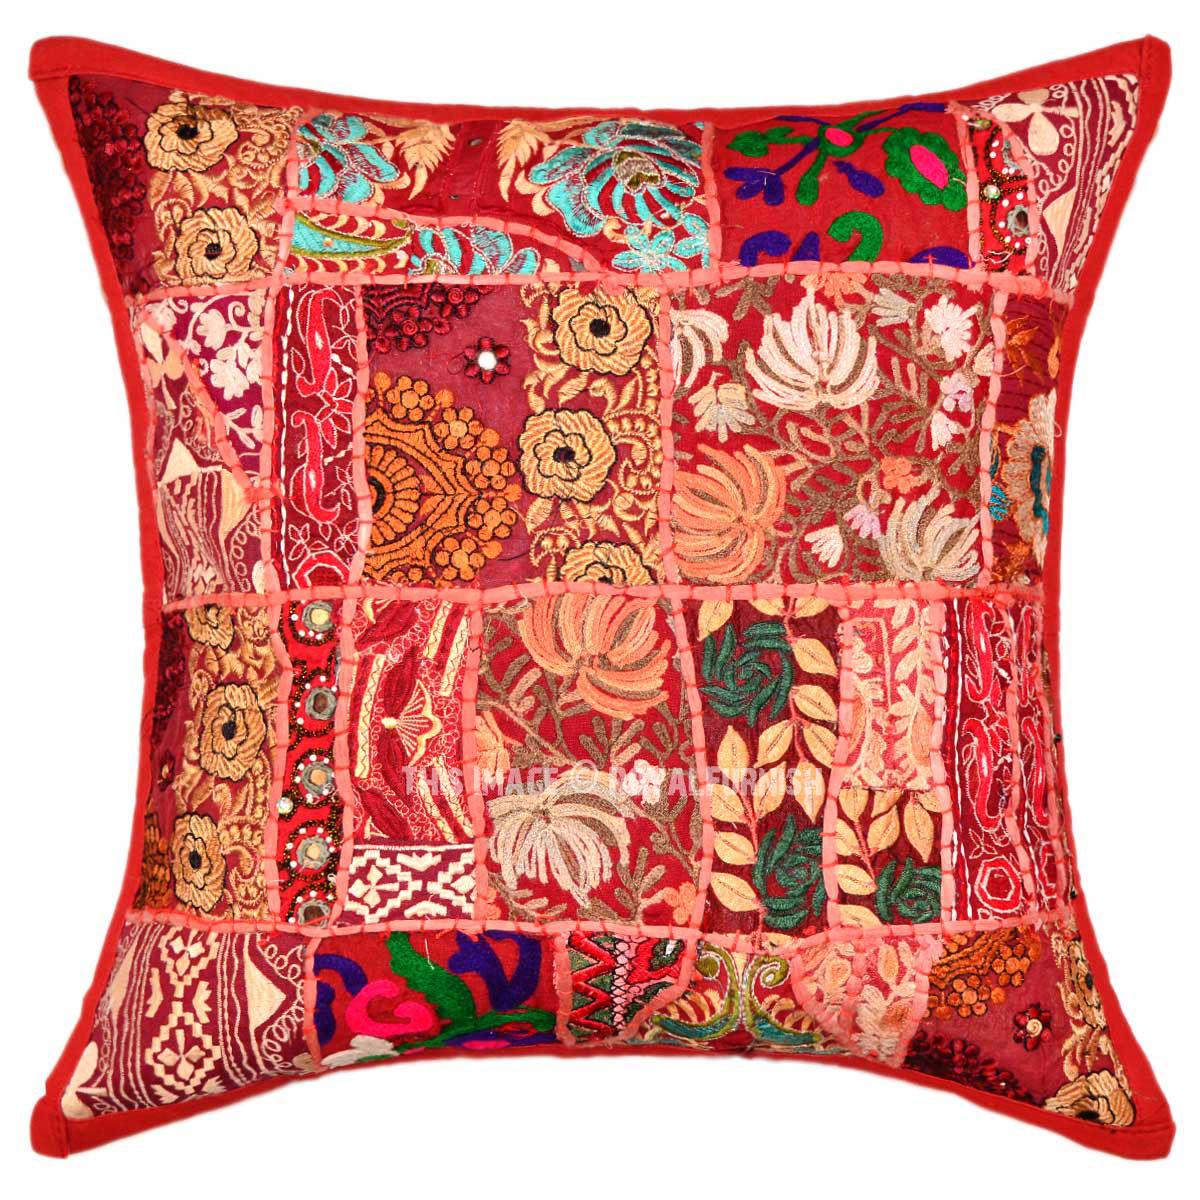 Throw Me A Pillow Coupon Code : 18X18 Red Unique One-Of-A-Kind Patchwork Boho Throw Pillow Sham - RoyalFurnish.com